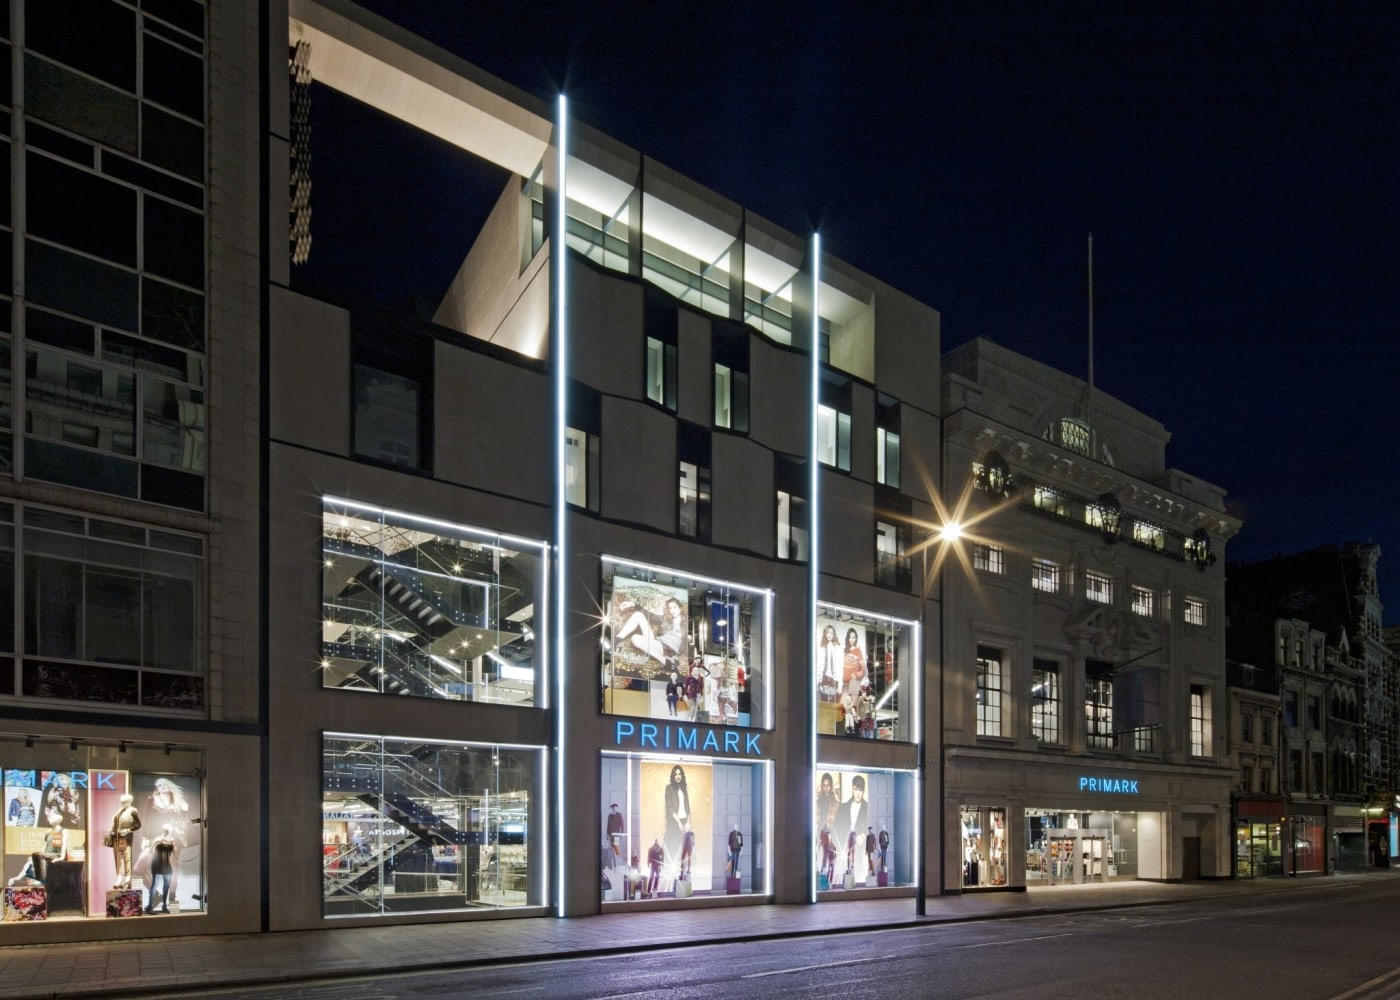 retail lighting design: Primark shop exterior